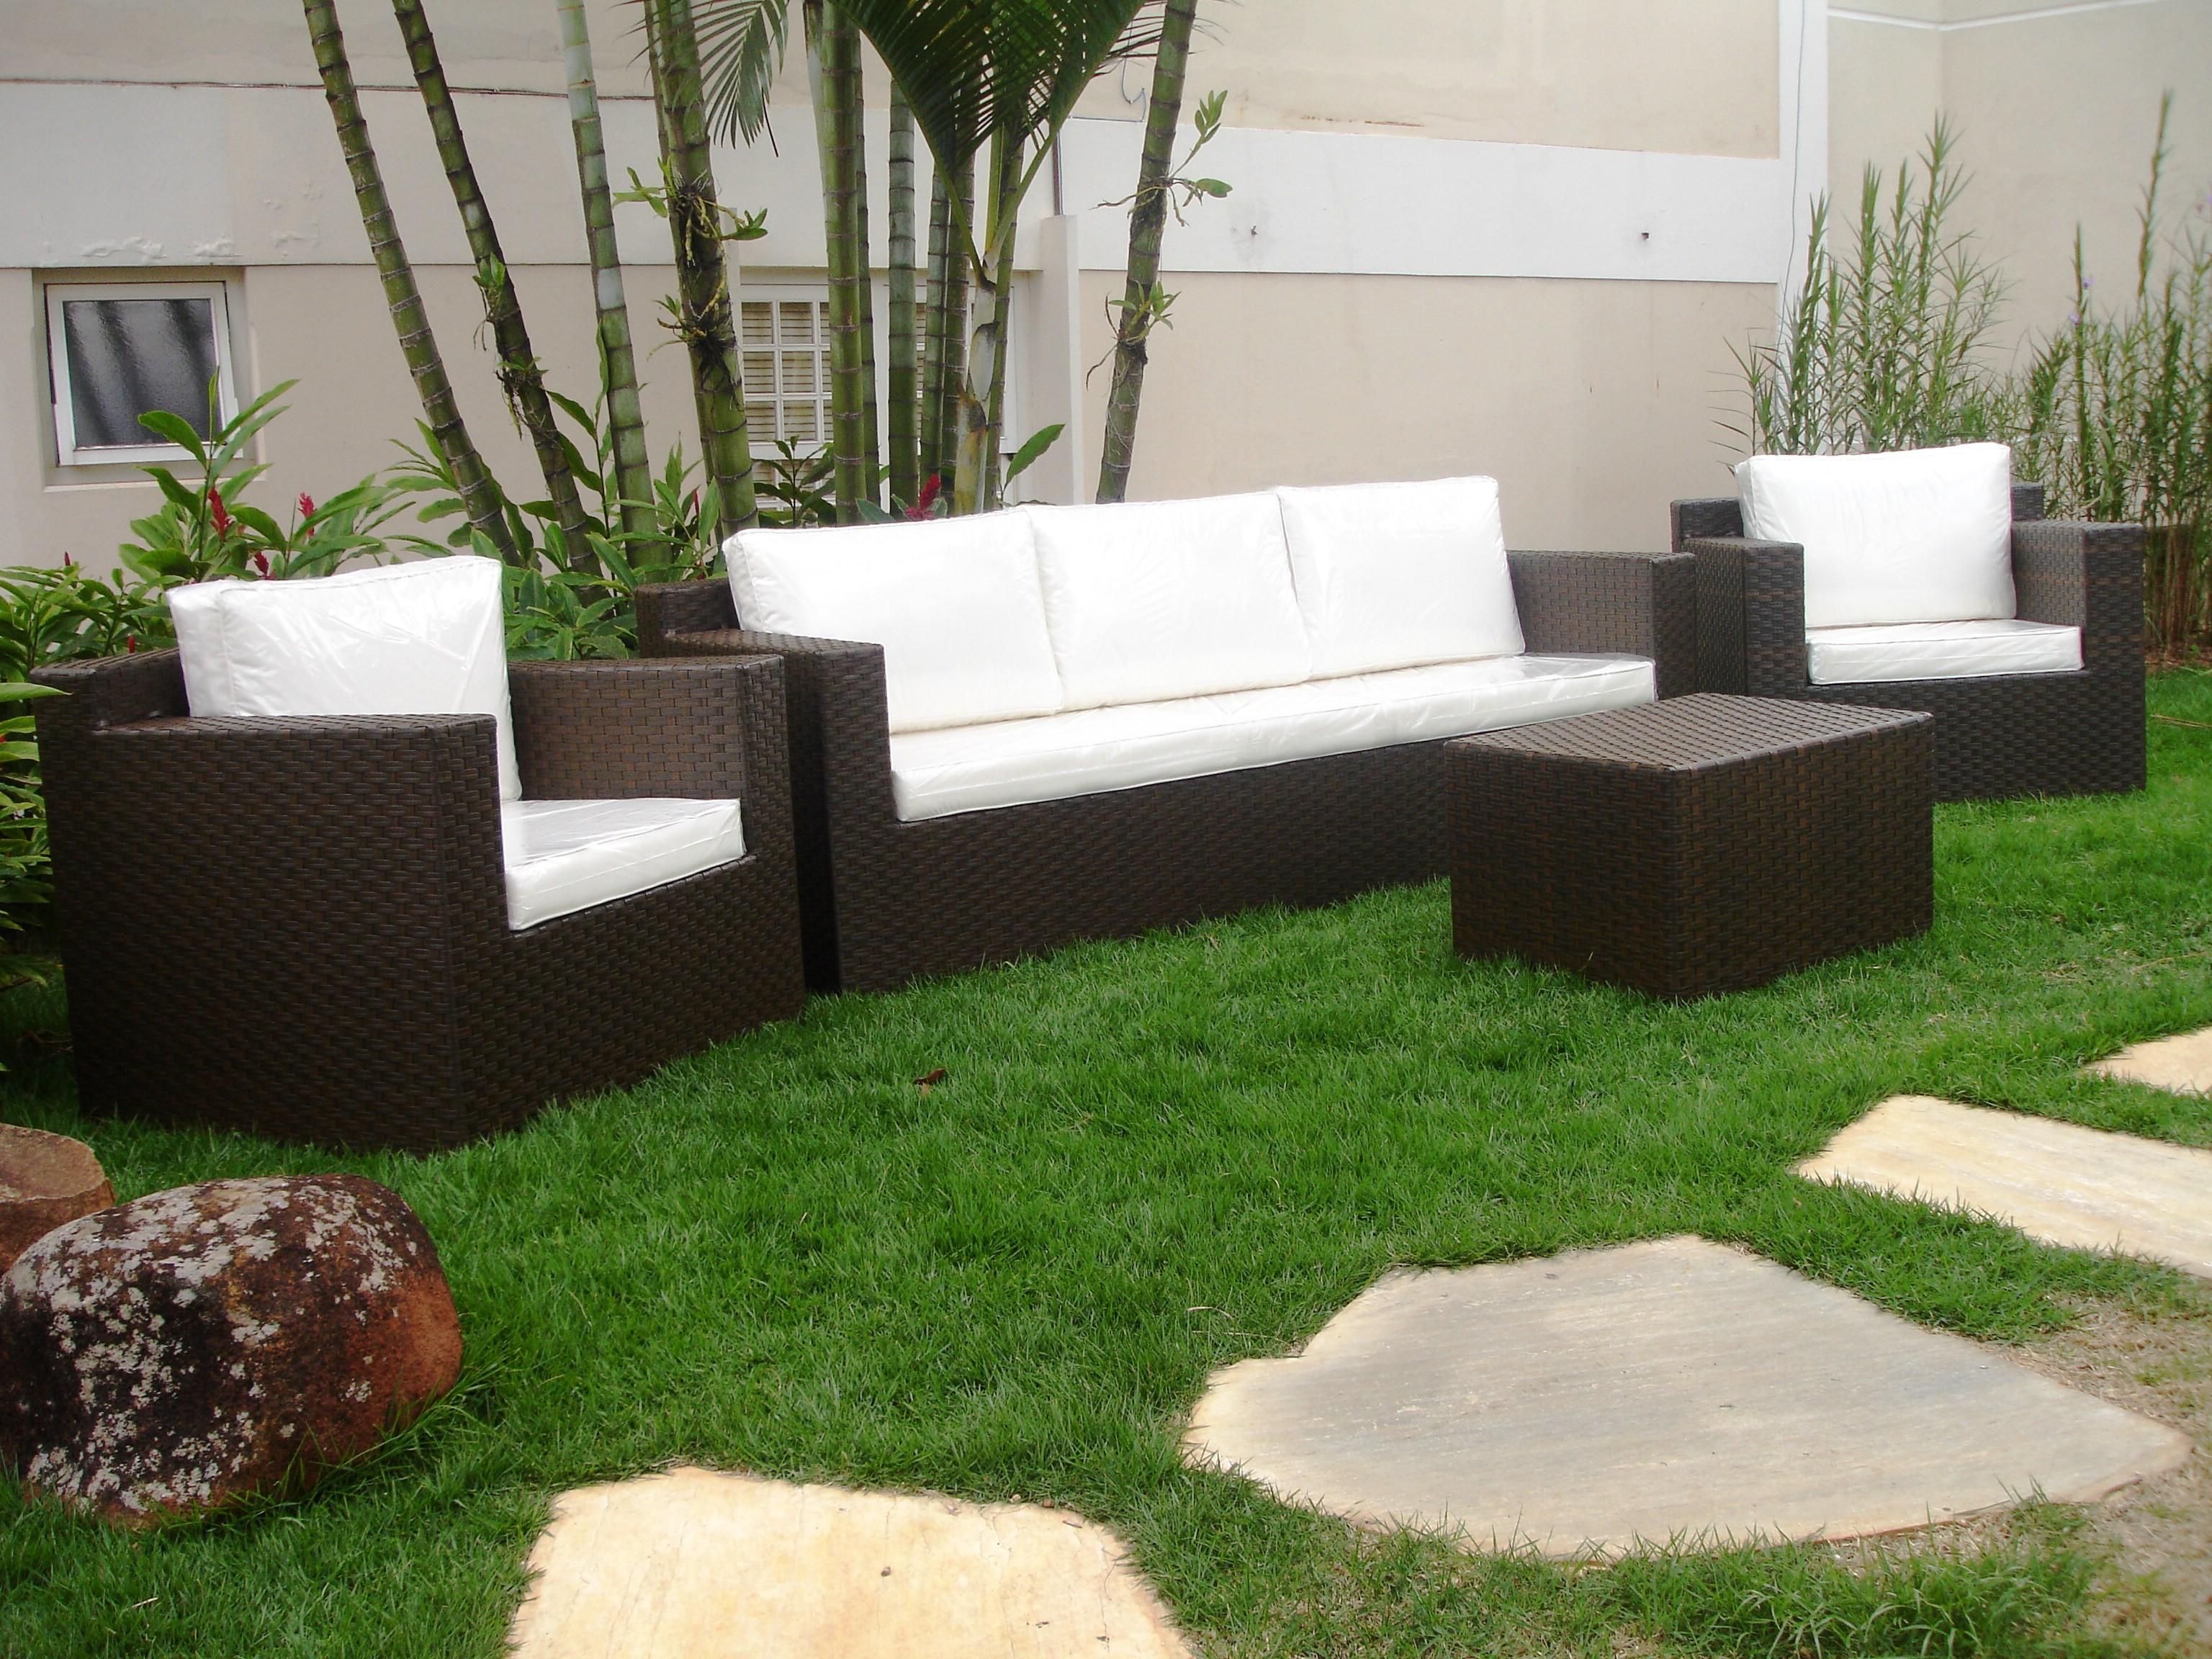 Móveis externos para jardim